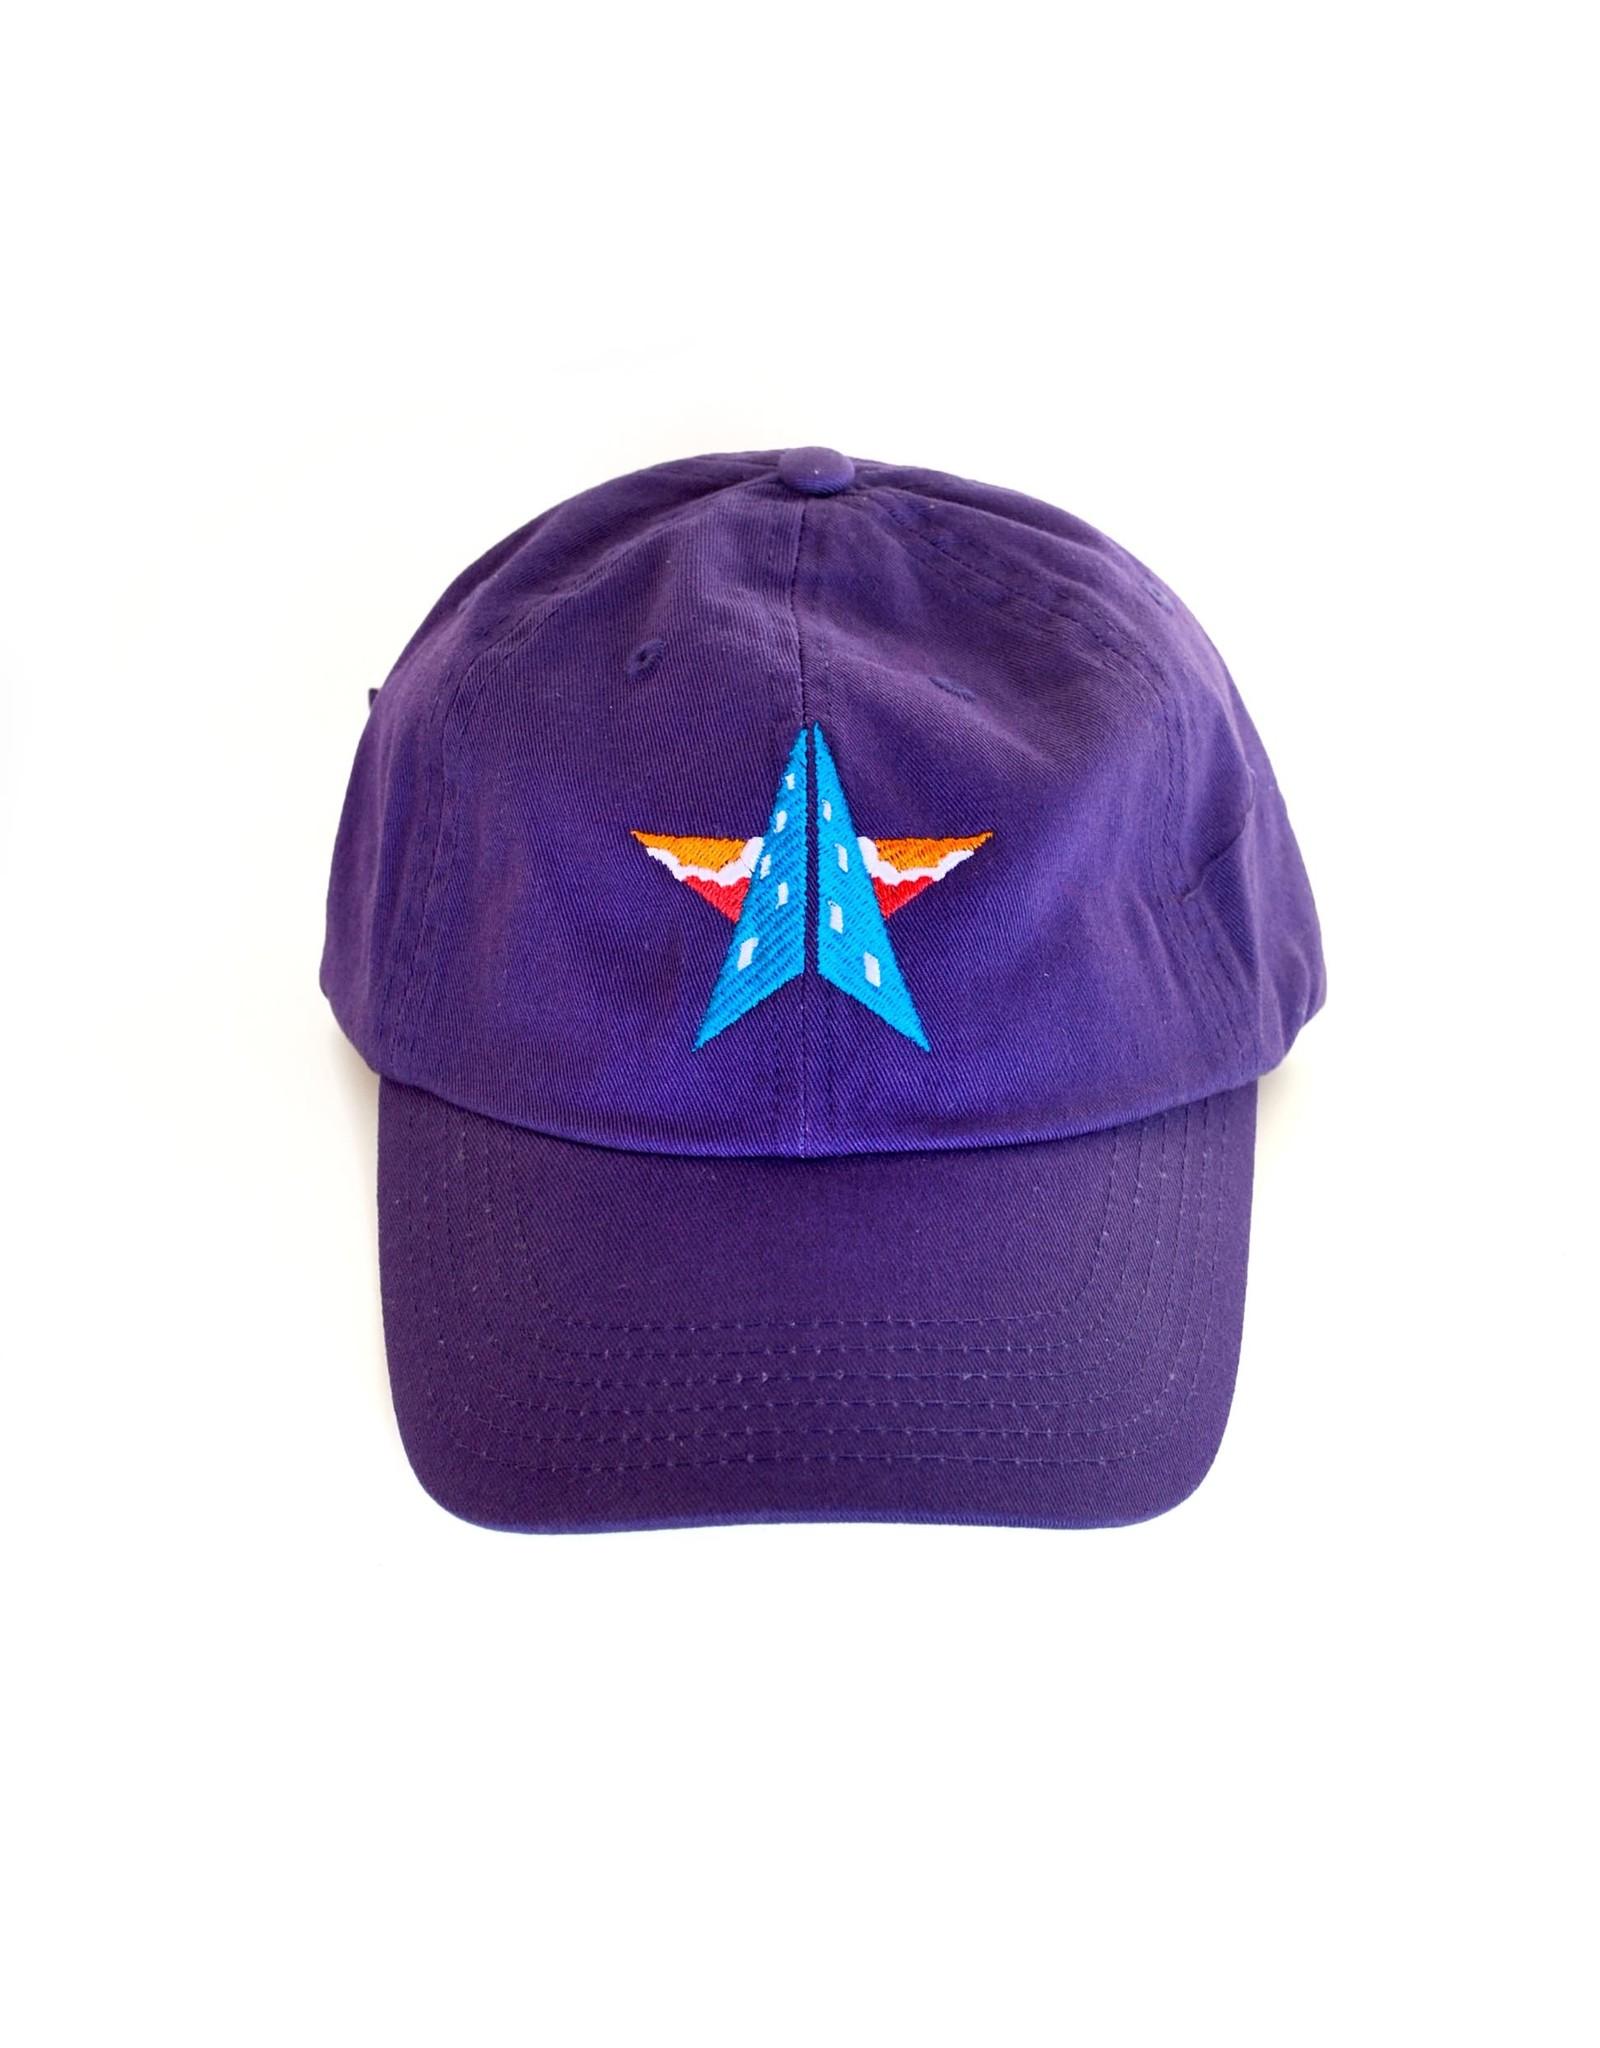 Manifest 2020 Hat